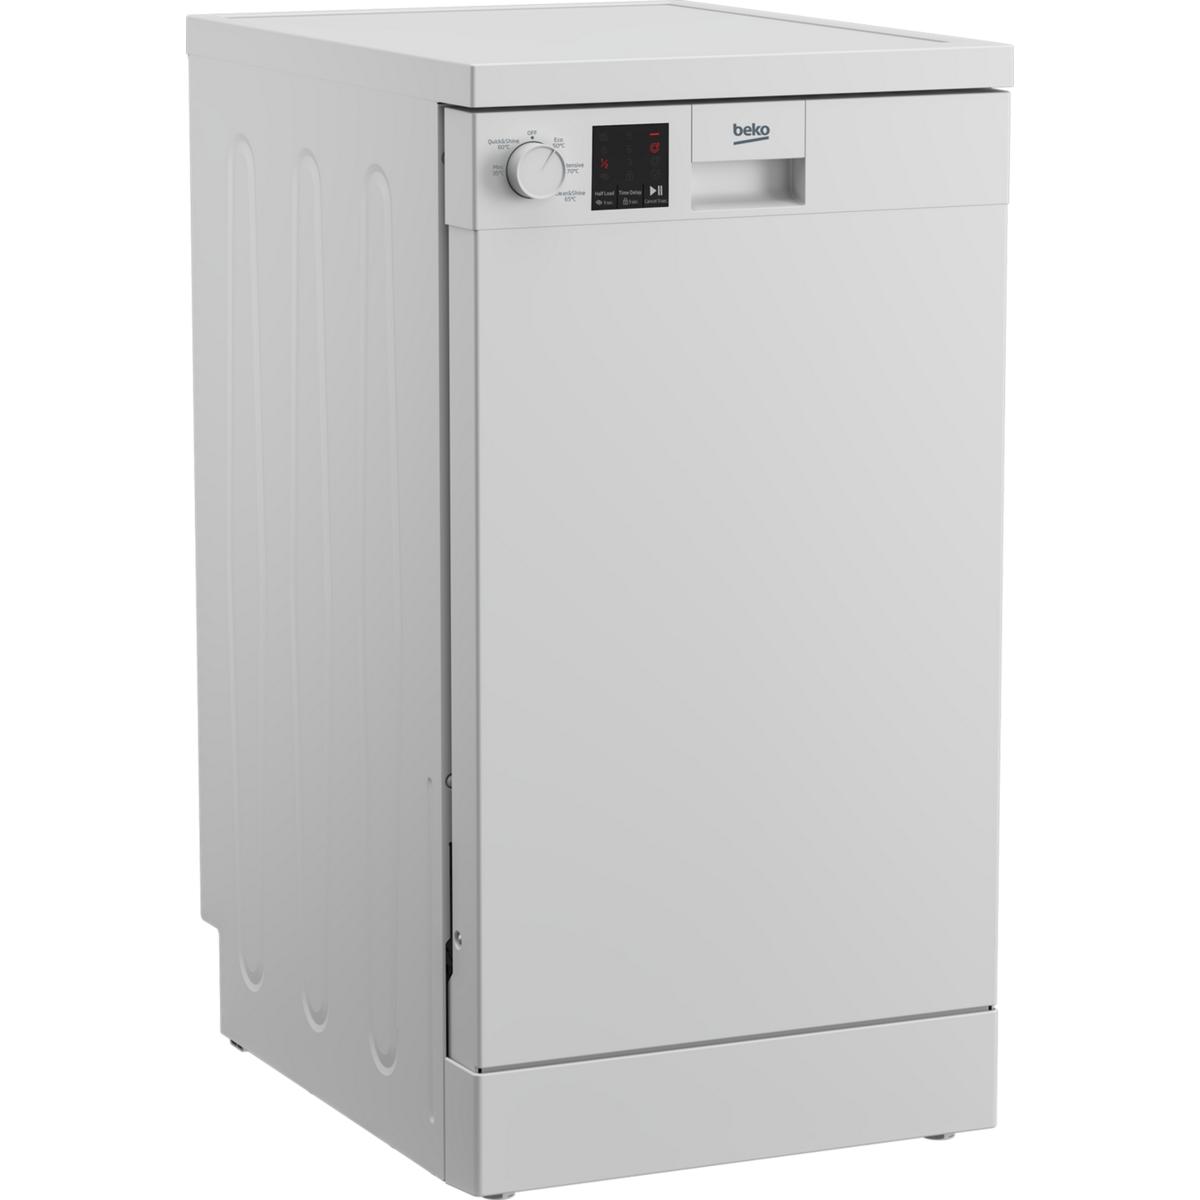 Beko DVS05C20W A++ Rated Slimline Dishwasher in White